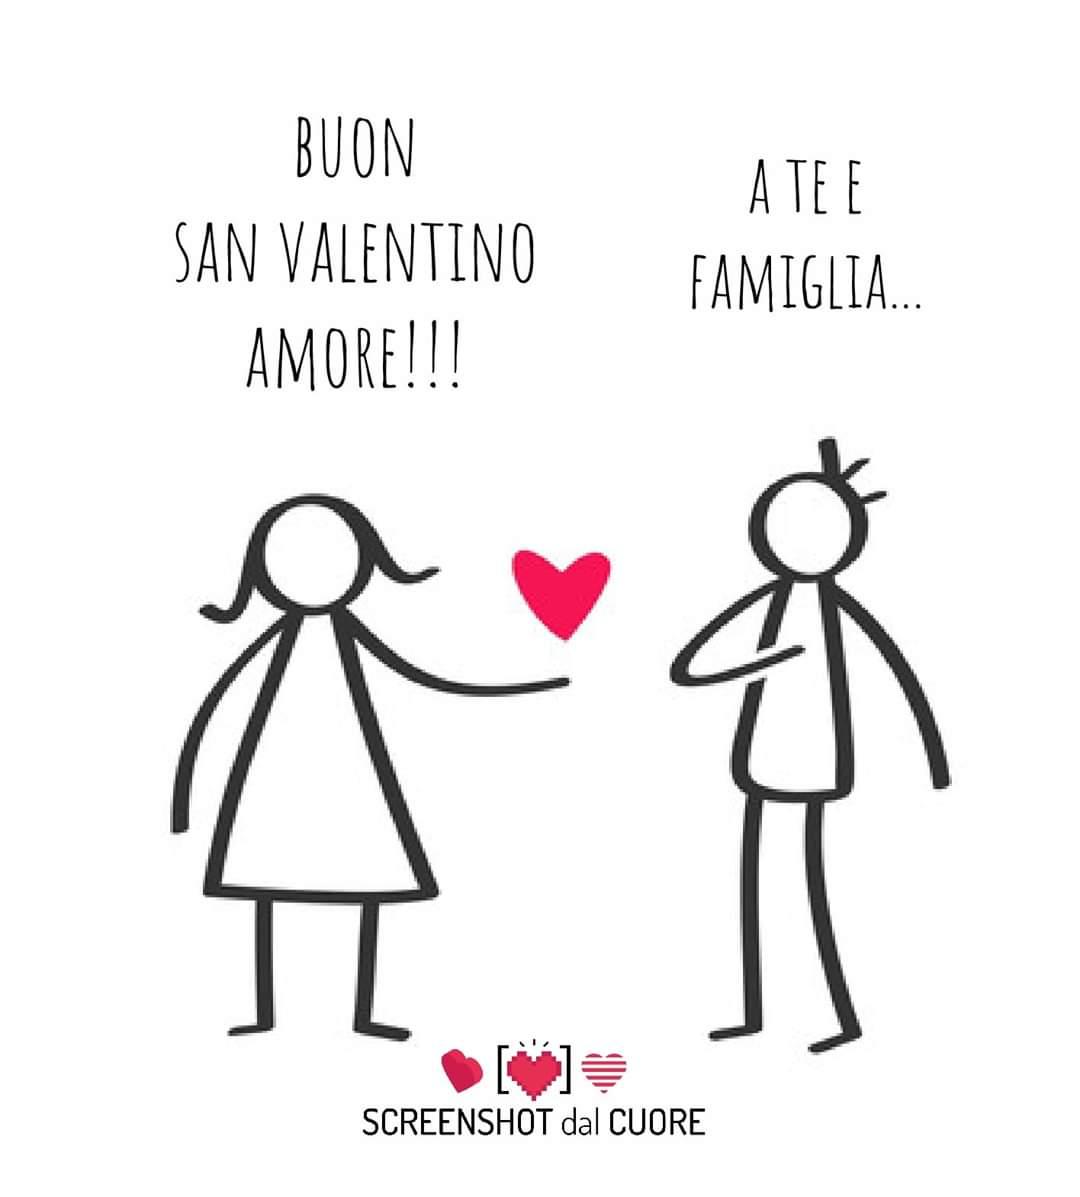 San Valentino 2020  #trumblr #frasitrumblr #scrittore #frasi #ultimiribelli #writer #trumblrpost #leggere #love #citazioni #aforismi #frasitop #frasibelle #frasivere #parole #poesia #versi #citazioni #6sense #pensieri #frasiitaliane #scrivere #amore #emozioni #SanValentín2020pic.twitter.com/7reJtUjzE8